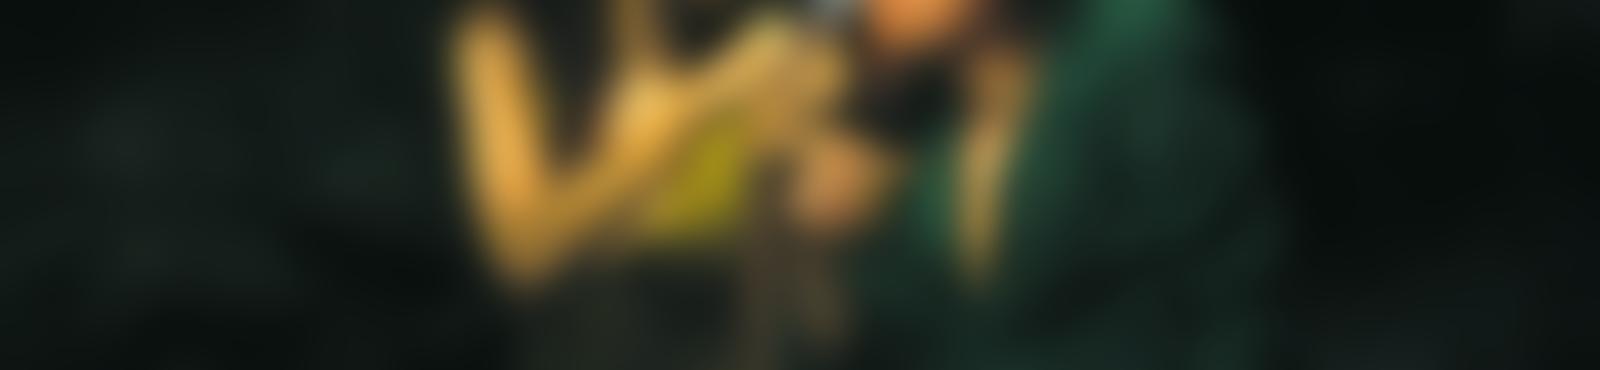 Blurred b672d0e4 7b56 4144 a4be c30a3733f851